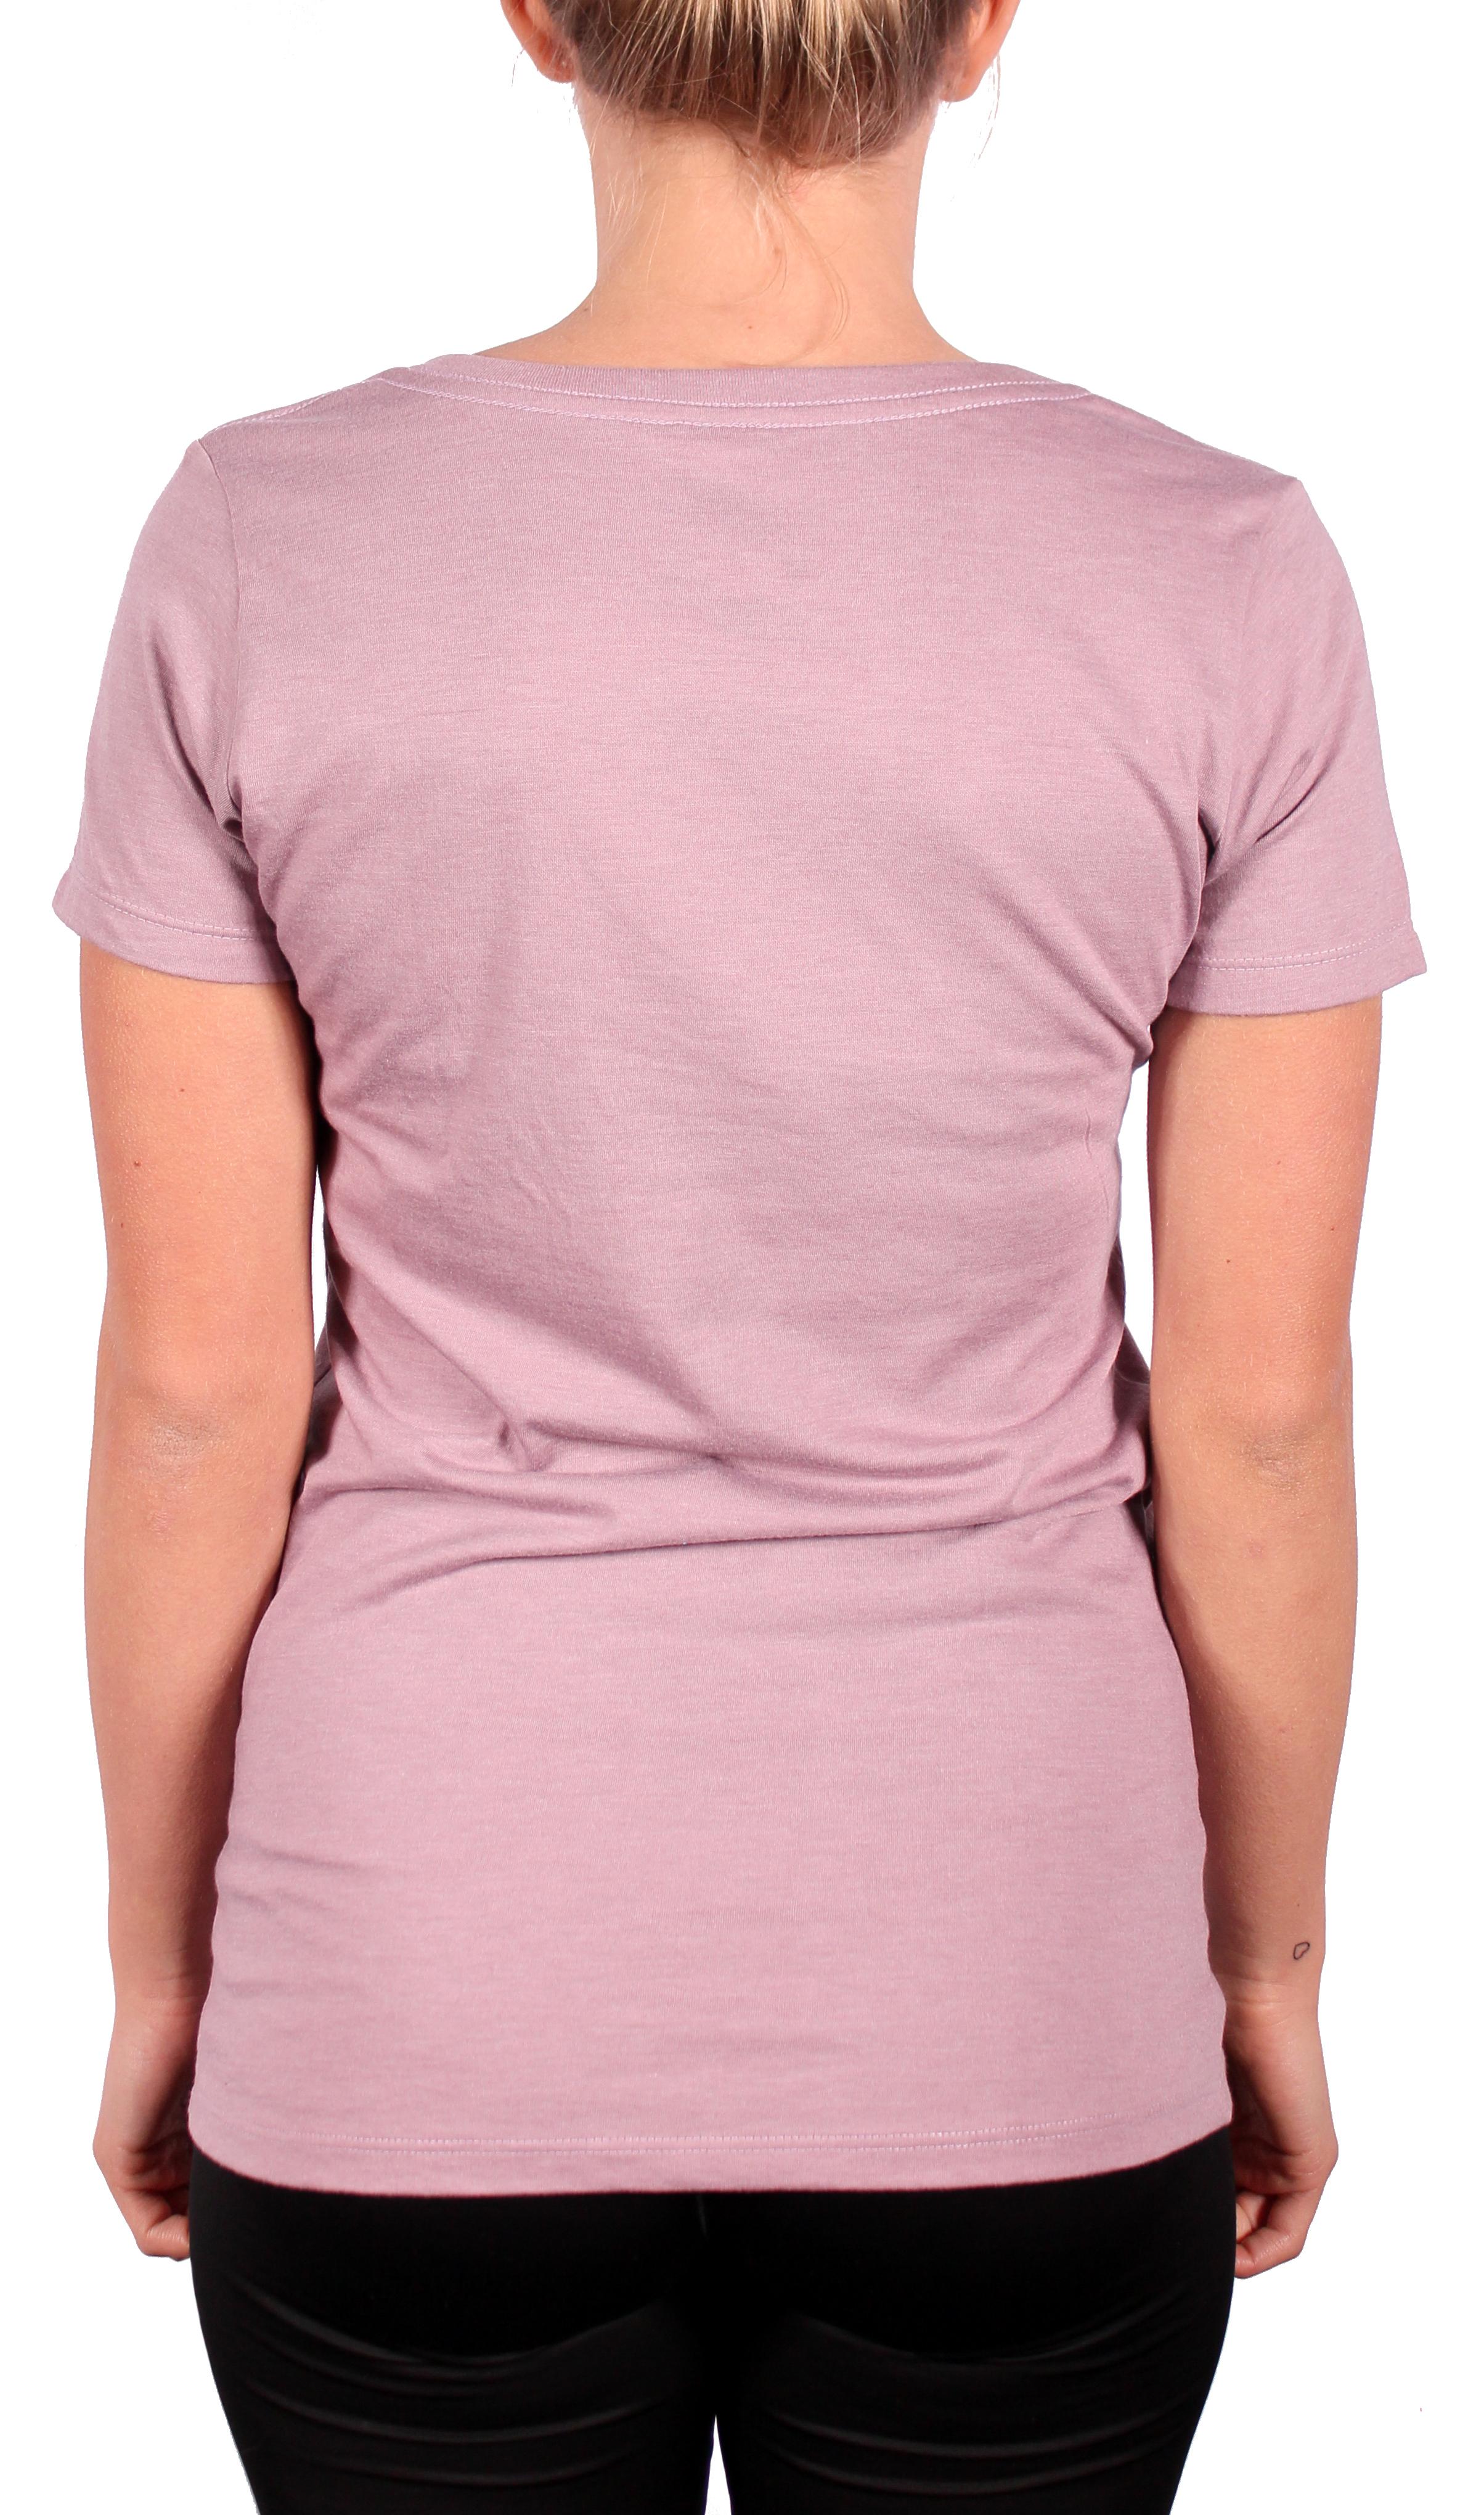 Koszulka Damska Burton Co-ed Rec (Heather Thistle)